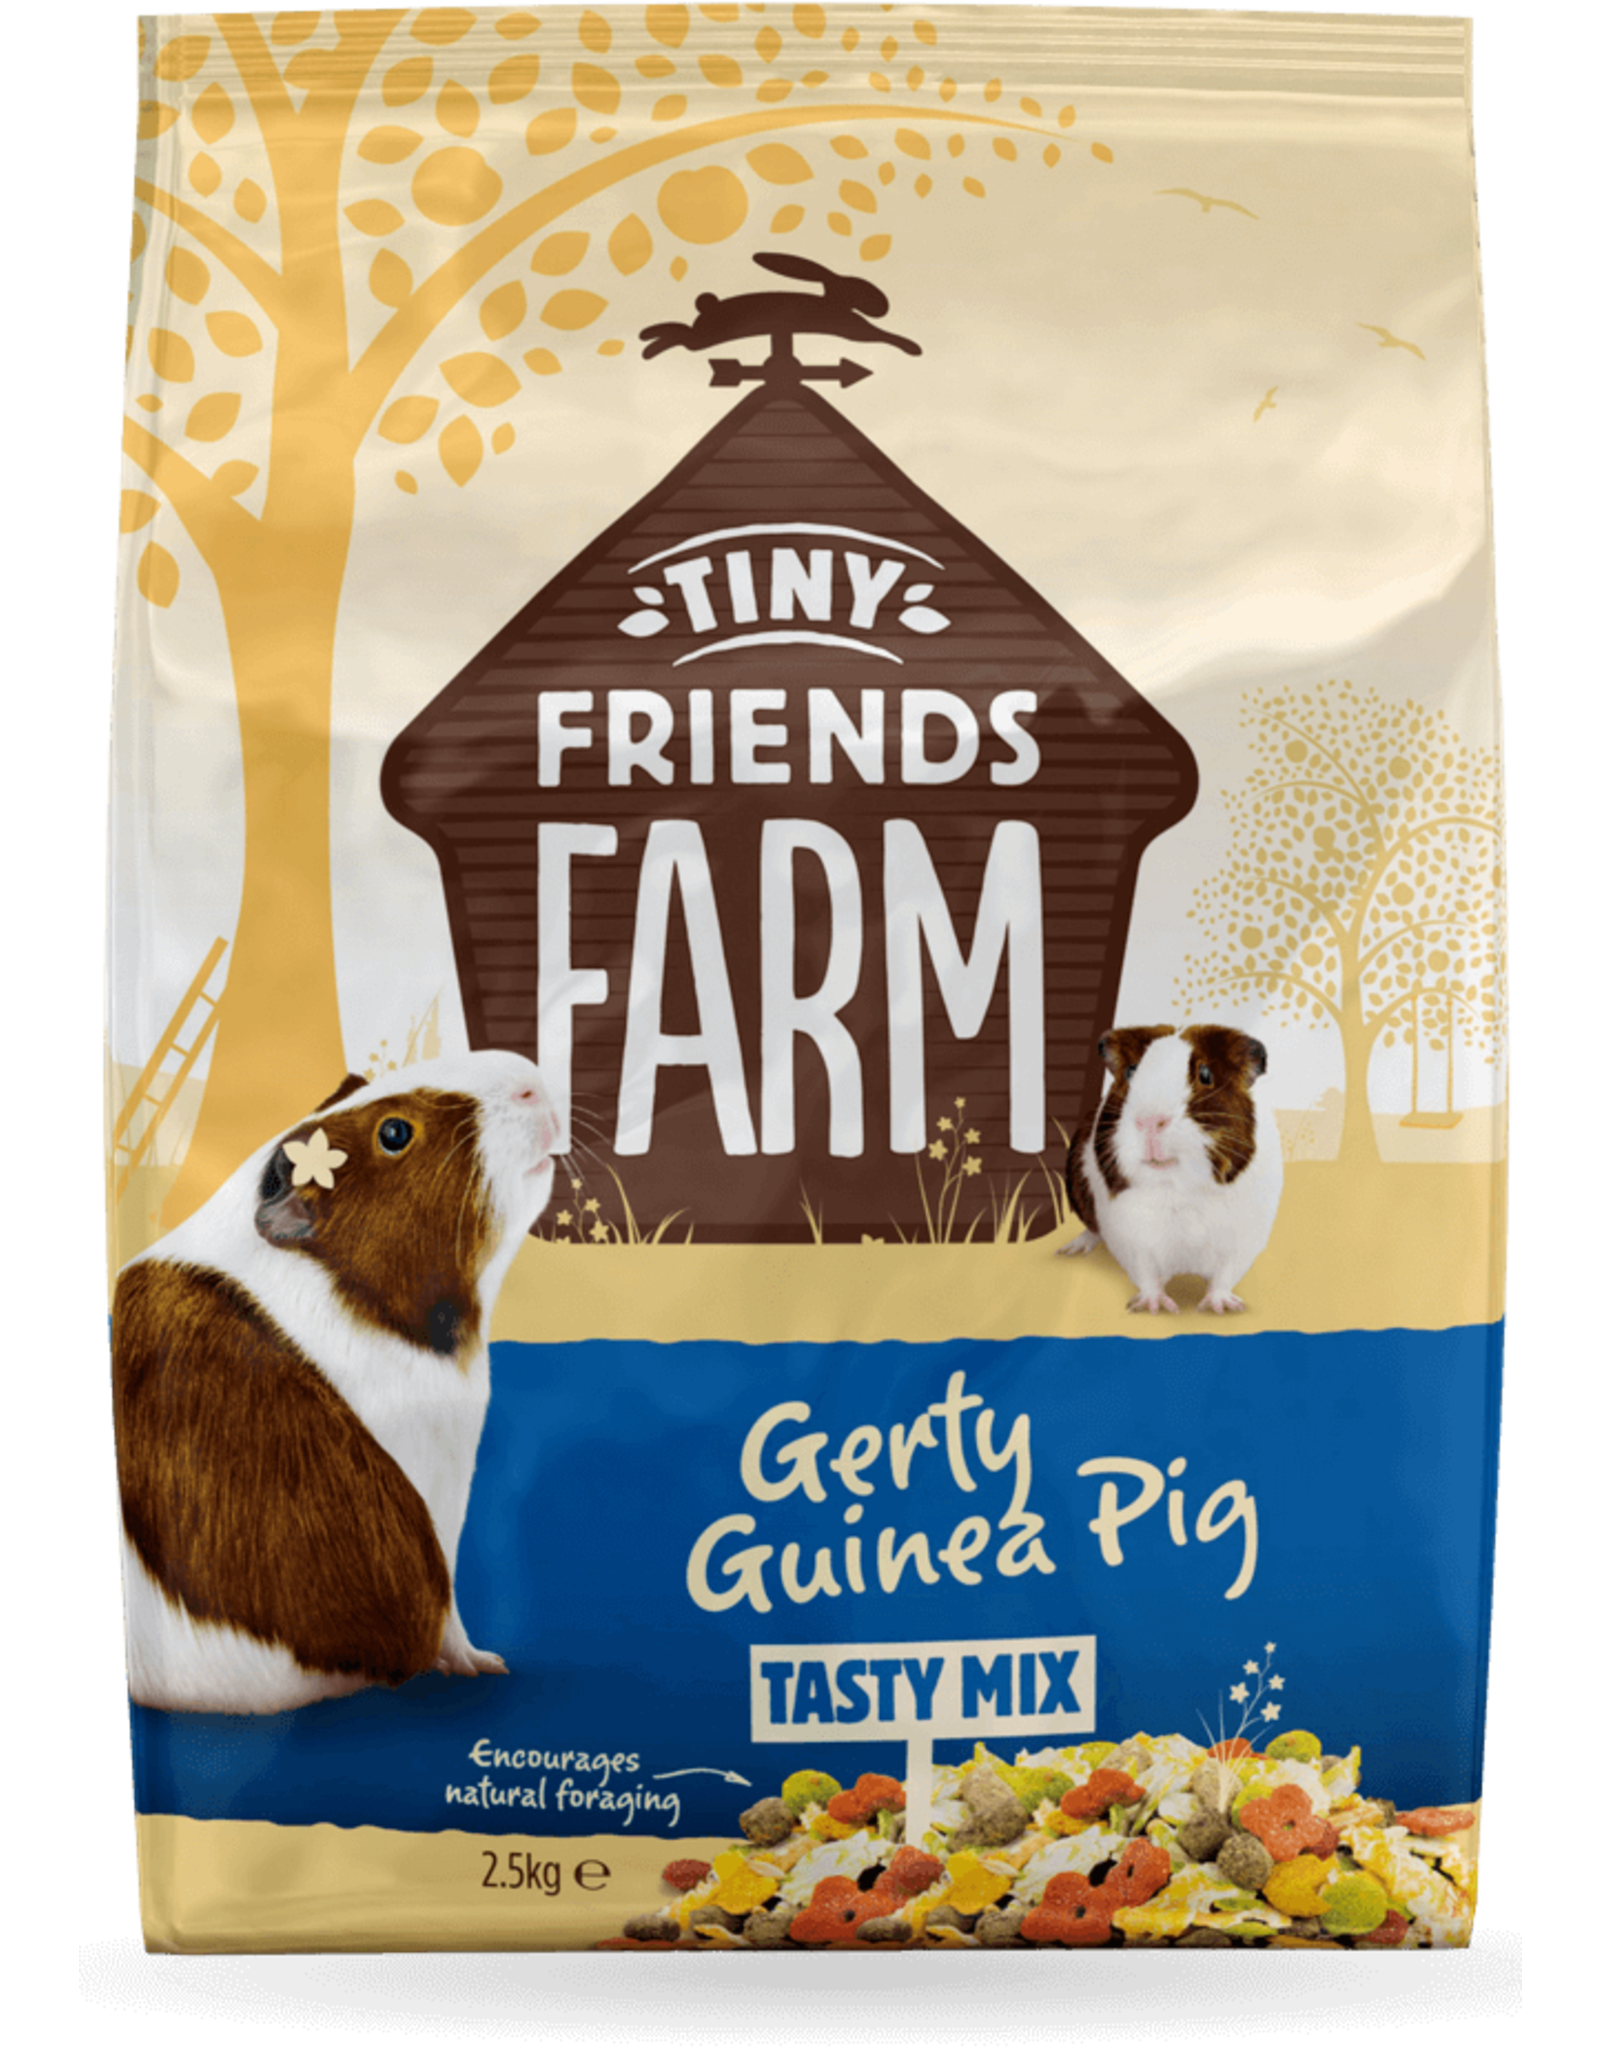 Supreme Pet Foods TINY FRIENDS FARM Gerty Guinea Pig Tasty Mix